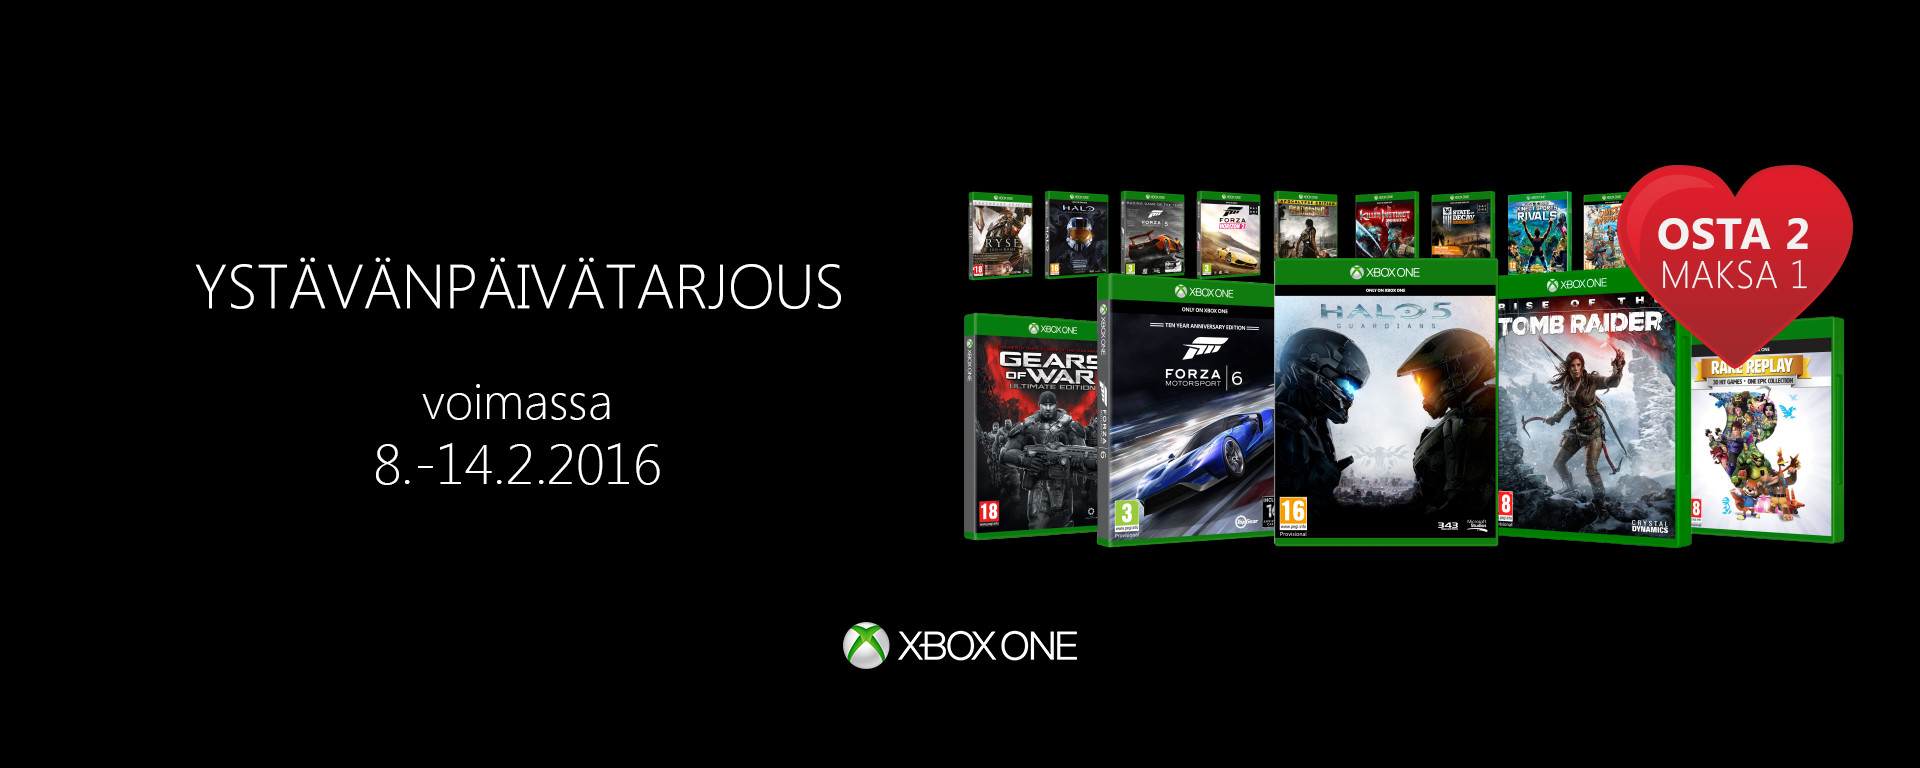 ystavanpaiva | Xbox One